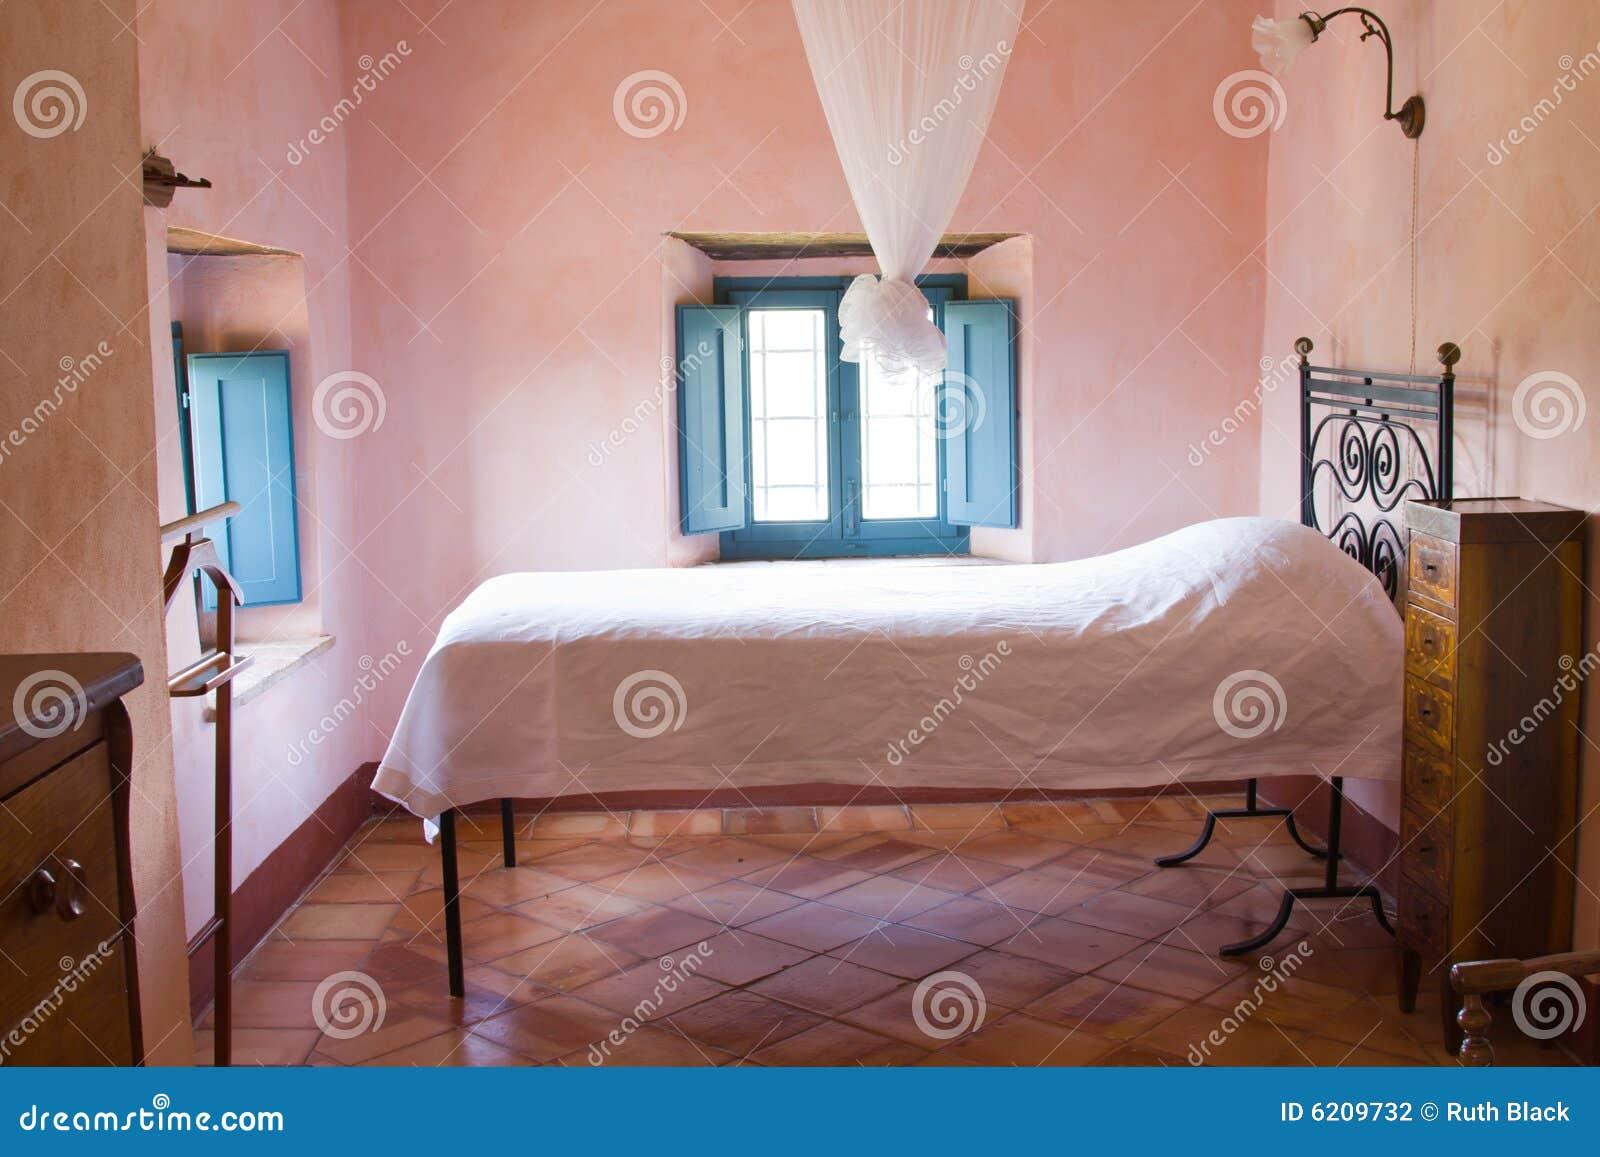 Chambre coucher rustique photographie stock image 6209732 for Chambre a coucher rustique